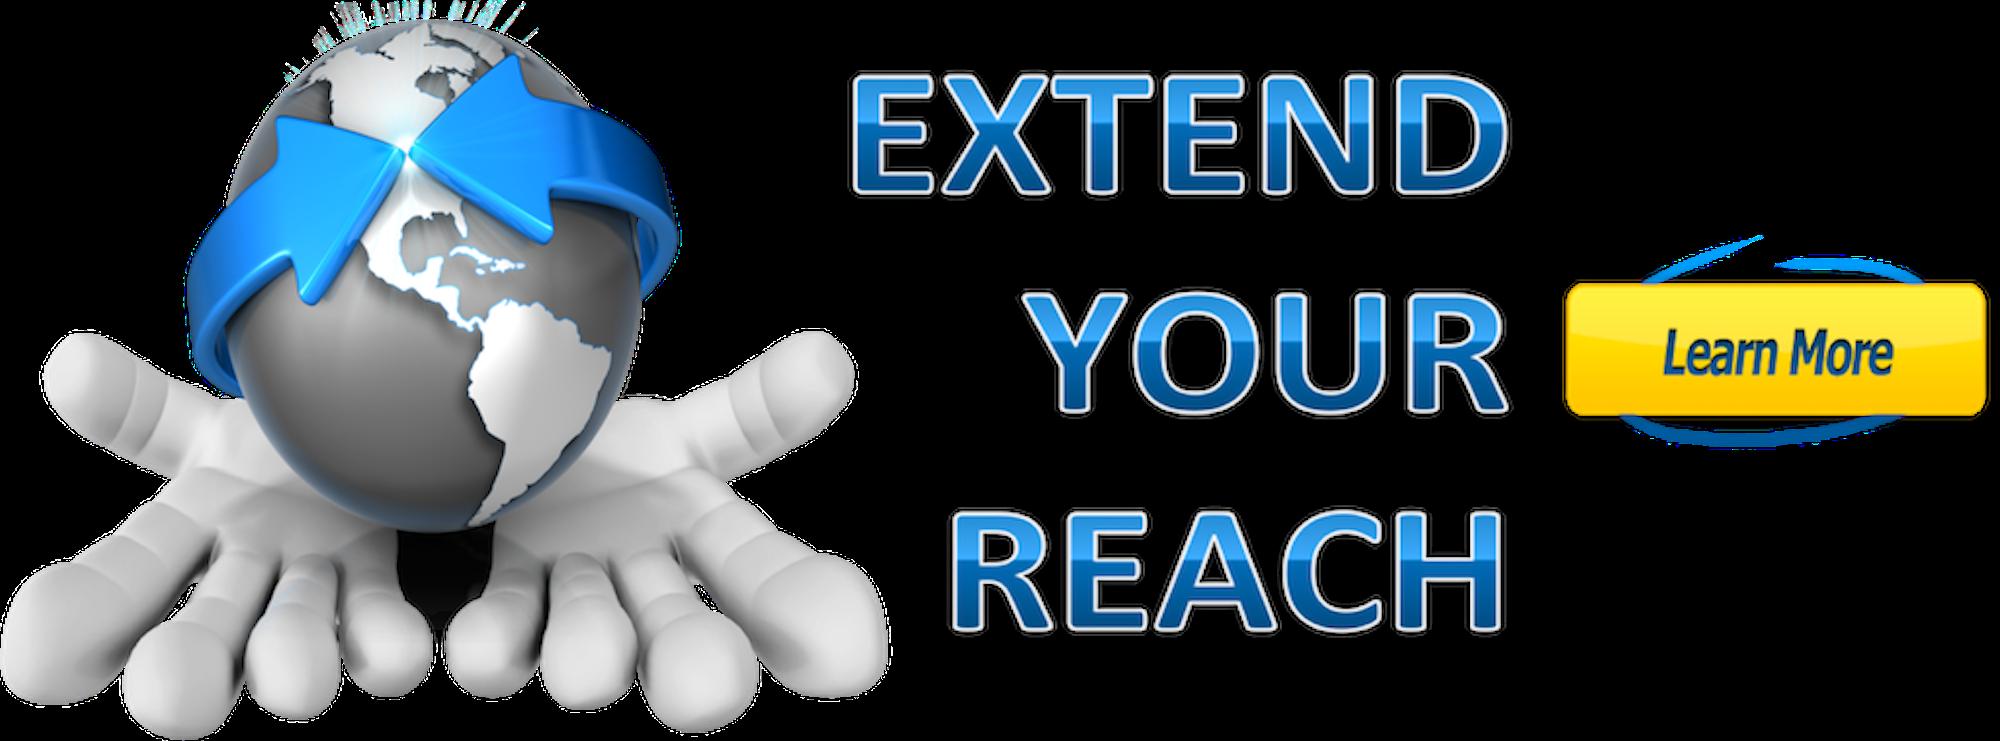 Extend your Reach